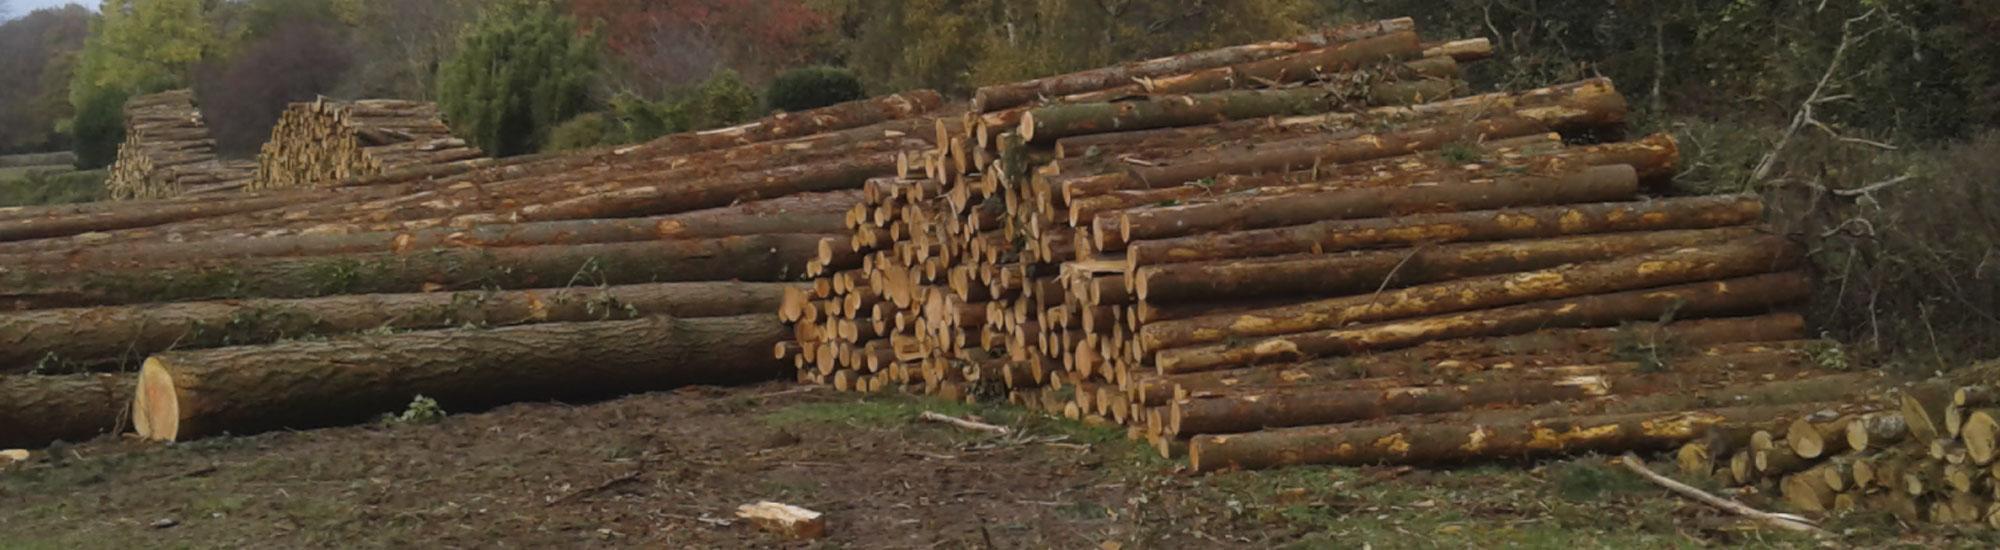 SARL TAURË gestion forestière